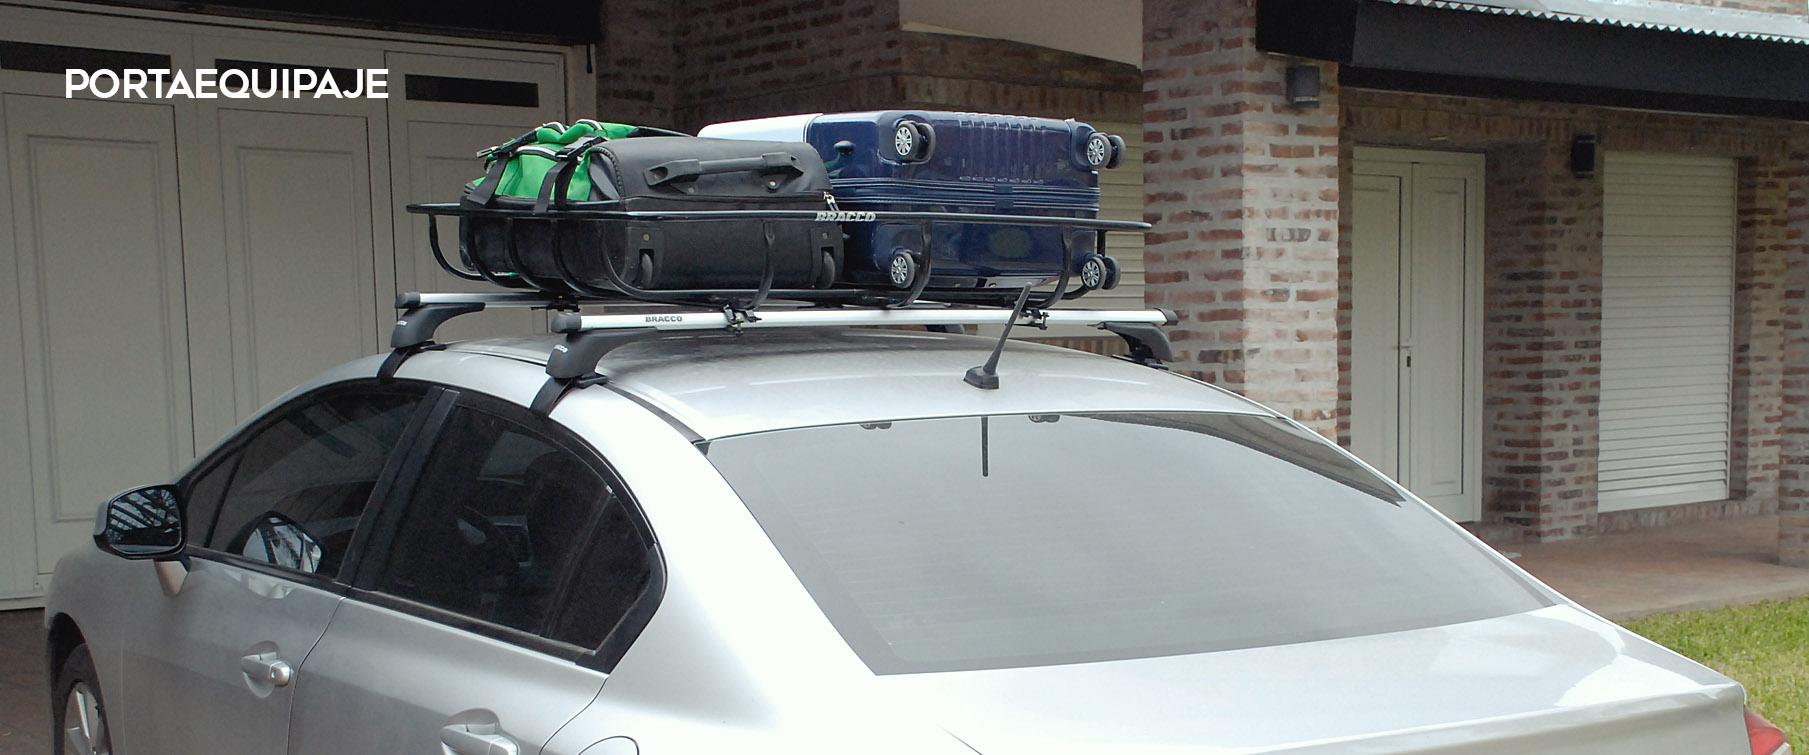 portaequipajes-para-automoviles-bracco-3